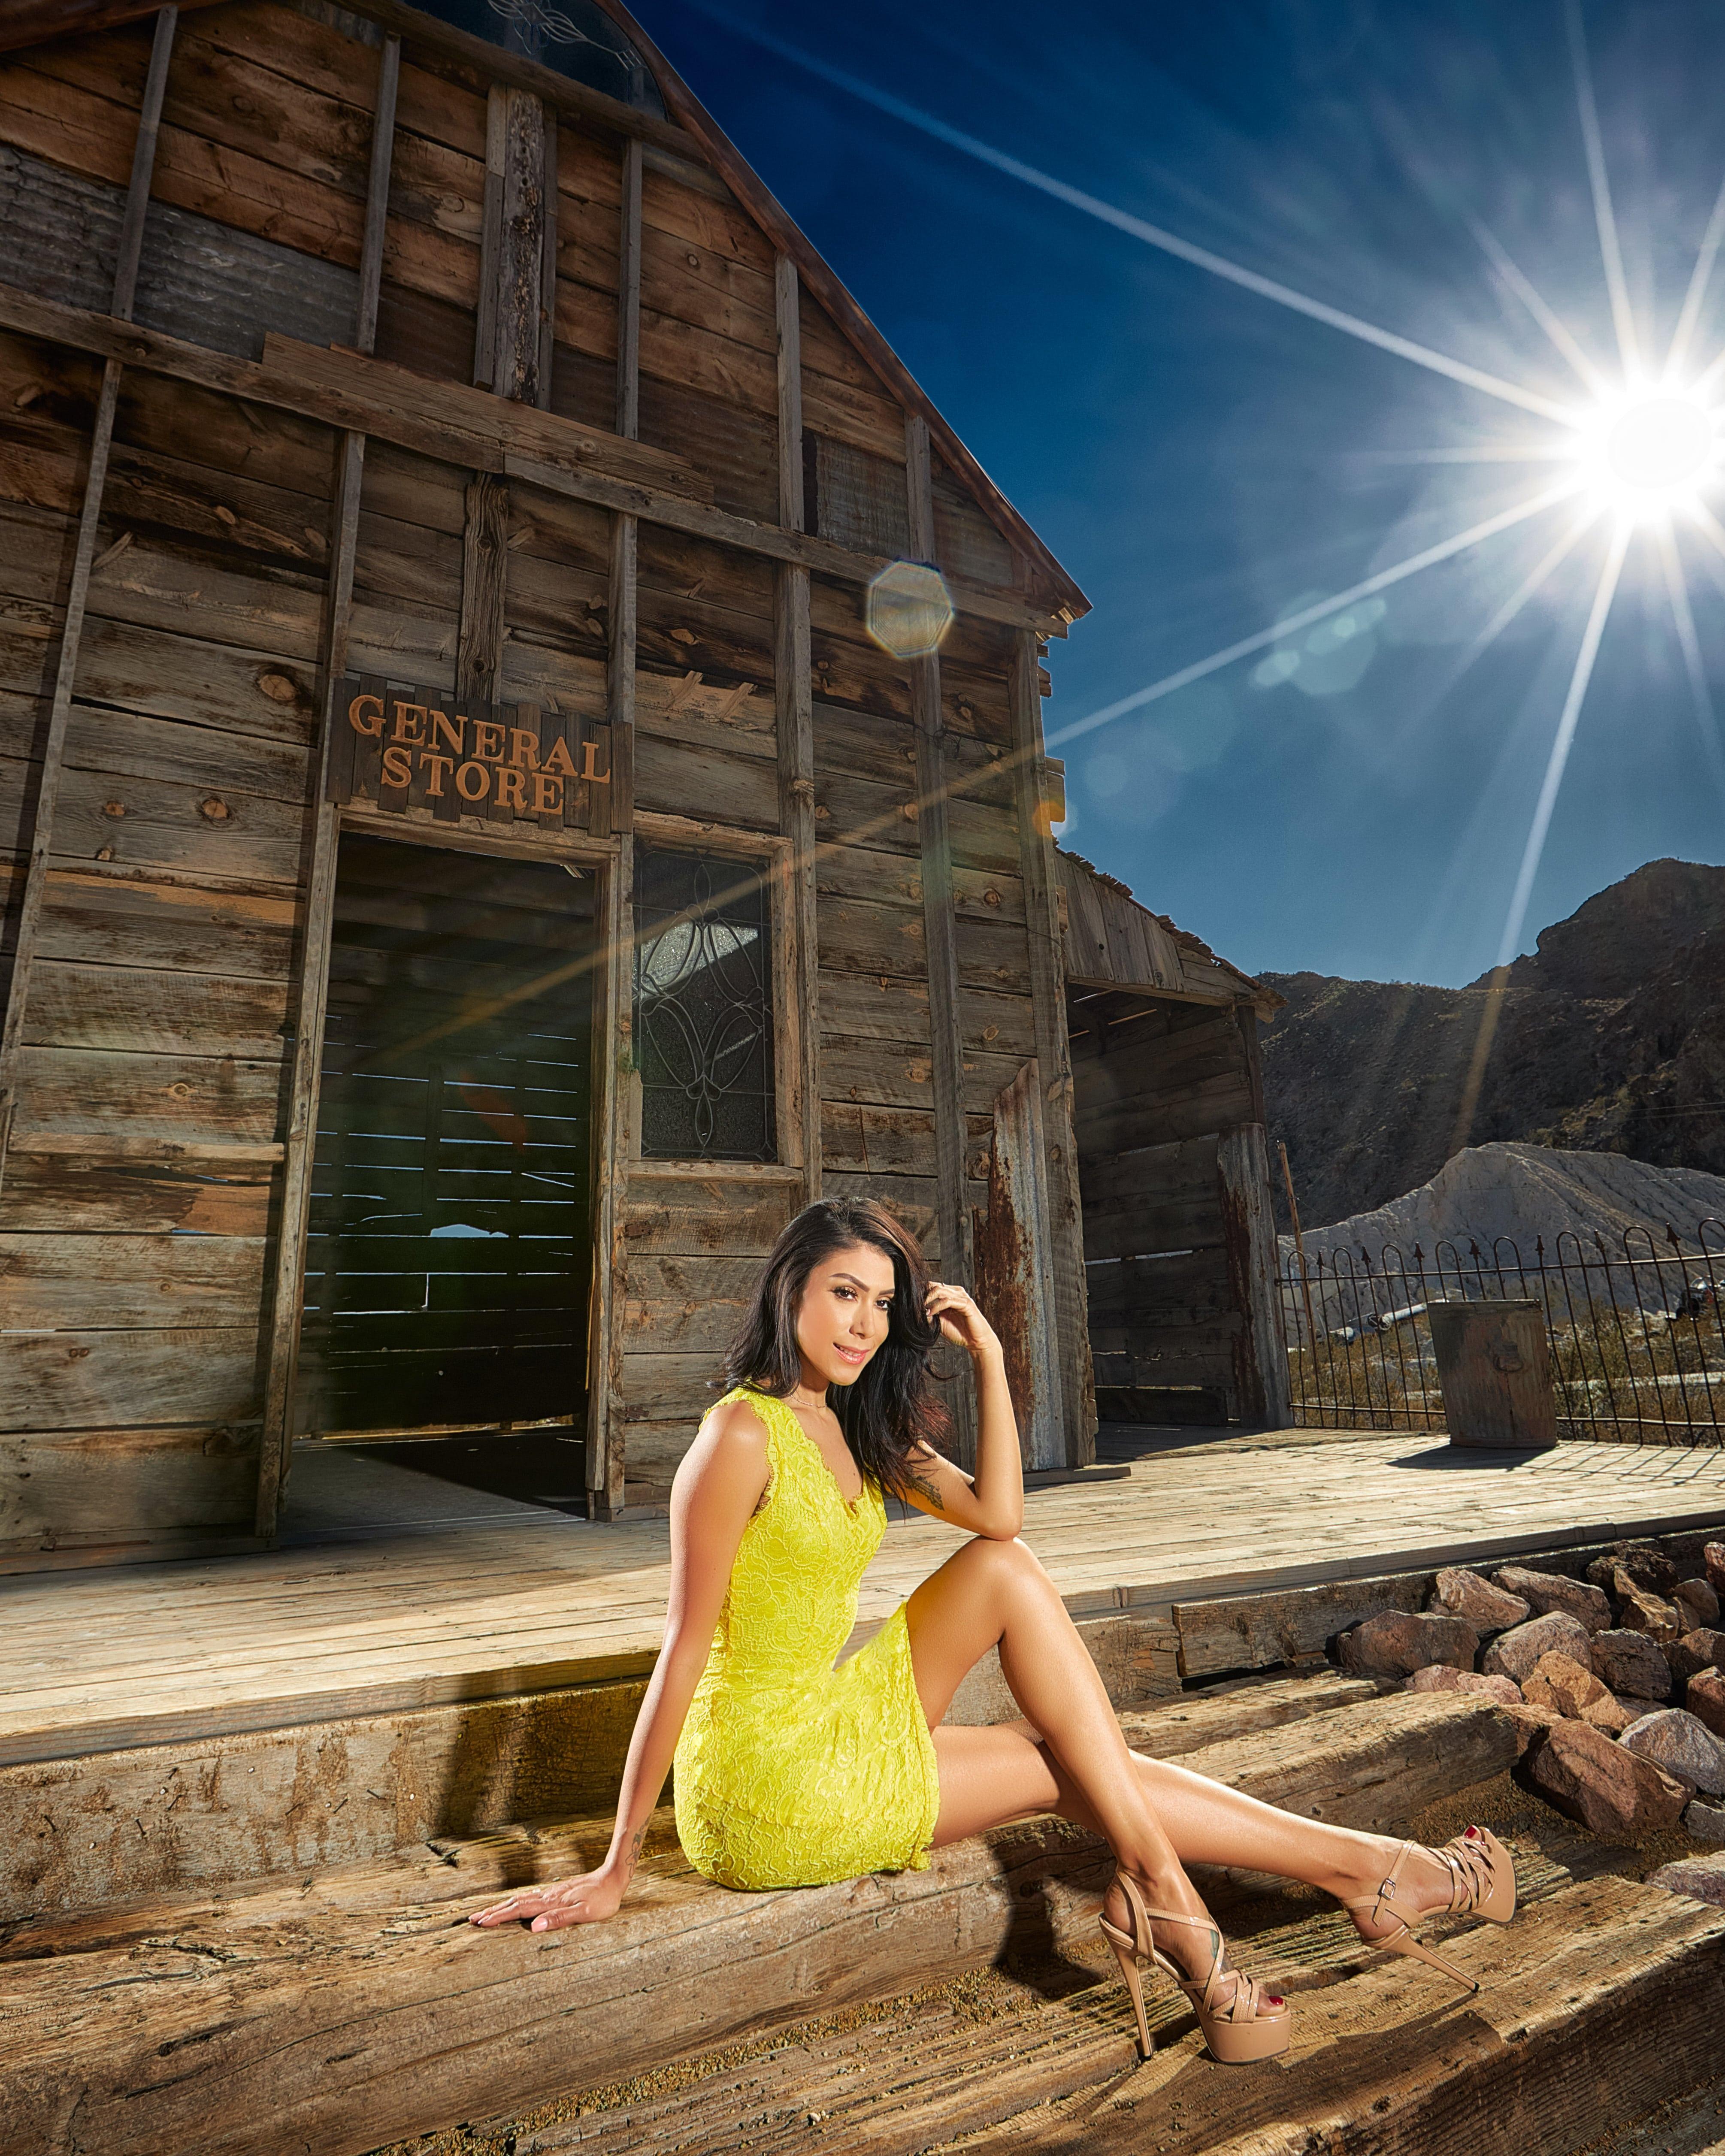 Las Vegas Photography Workshop